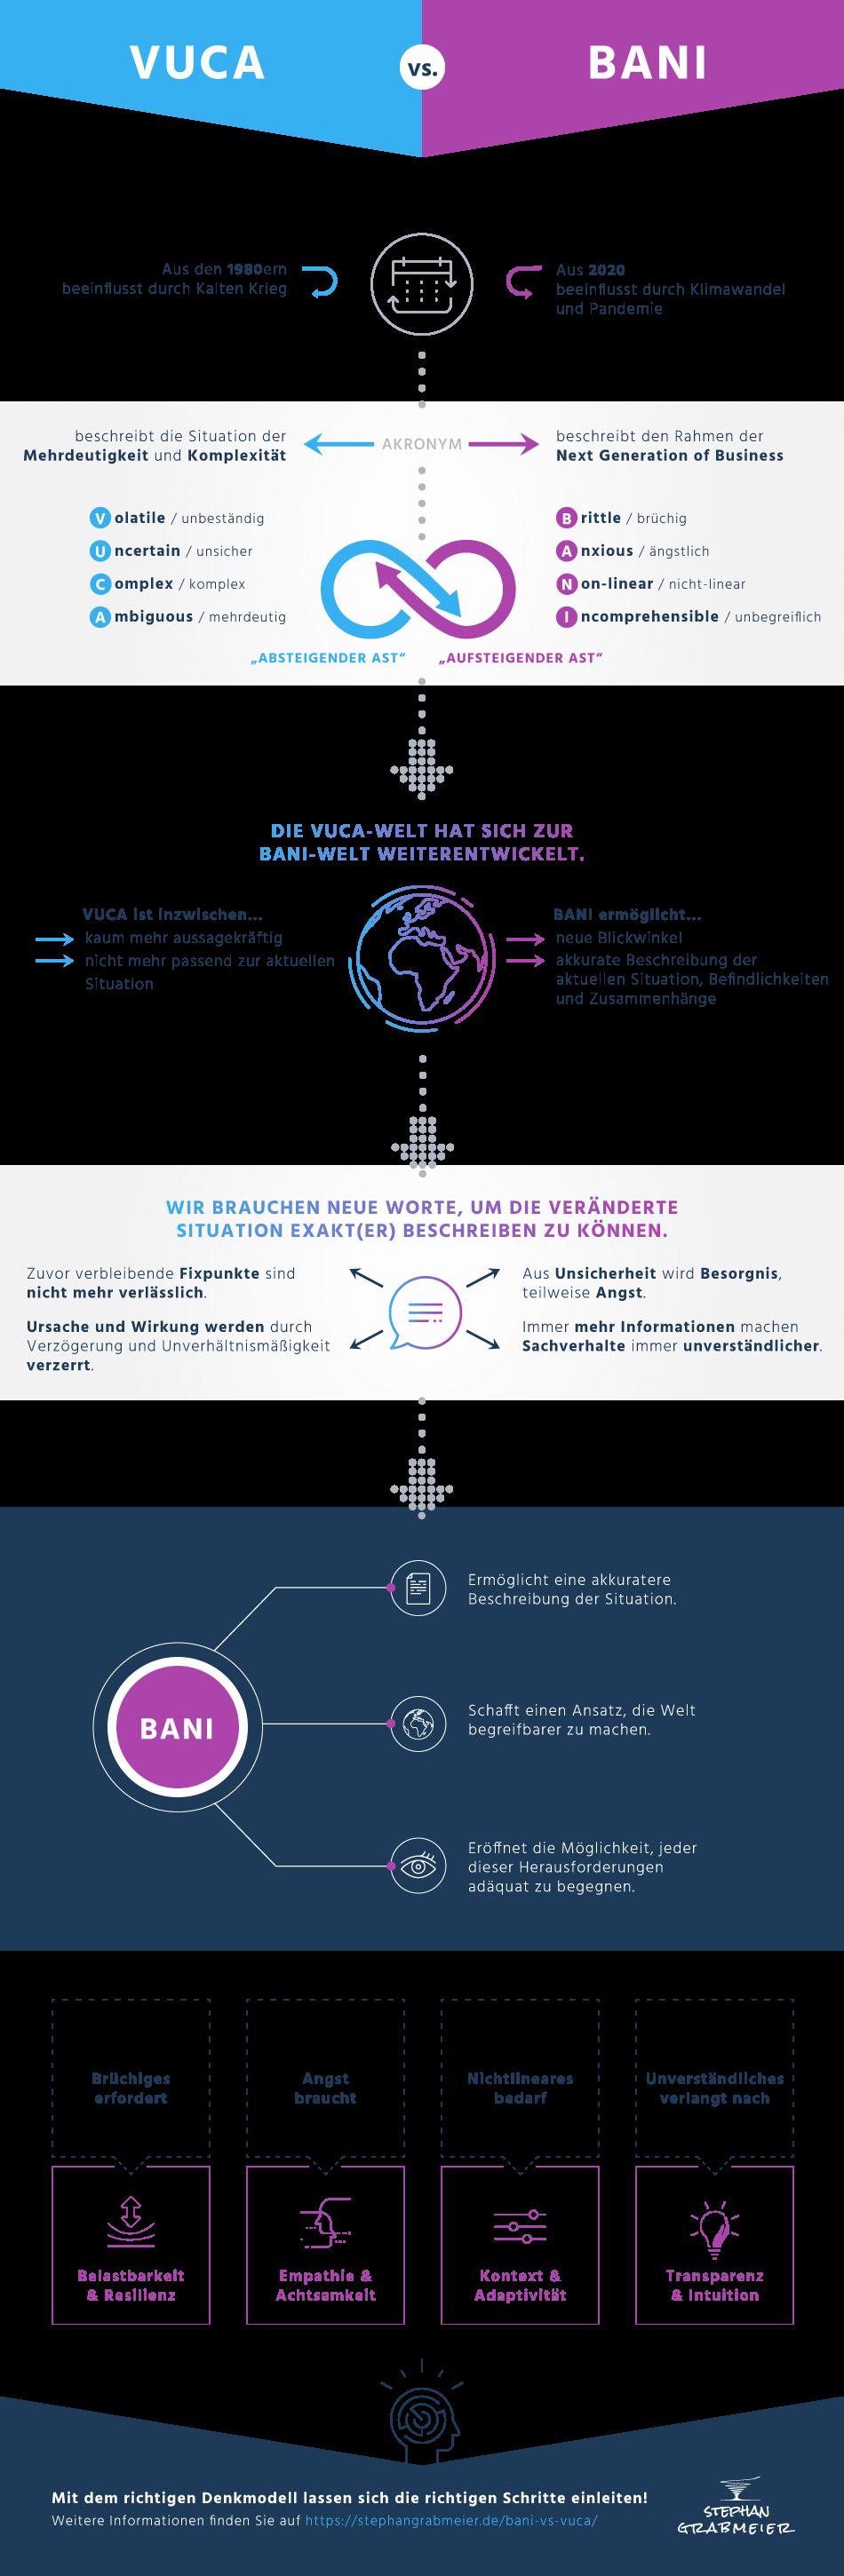 Vuca vs Bani Infografik